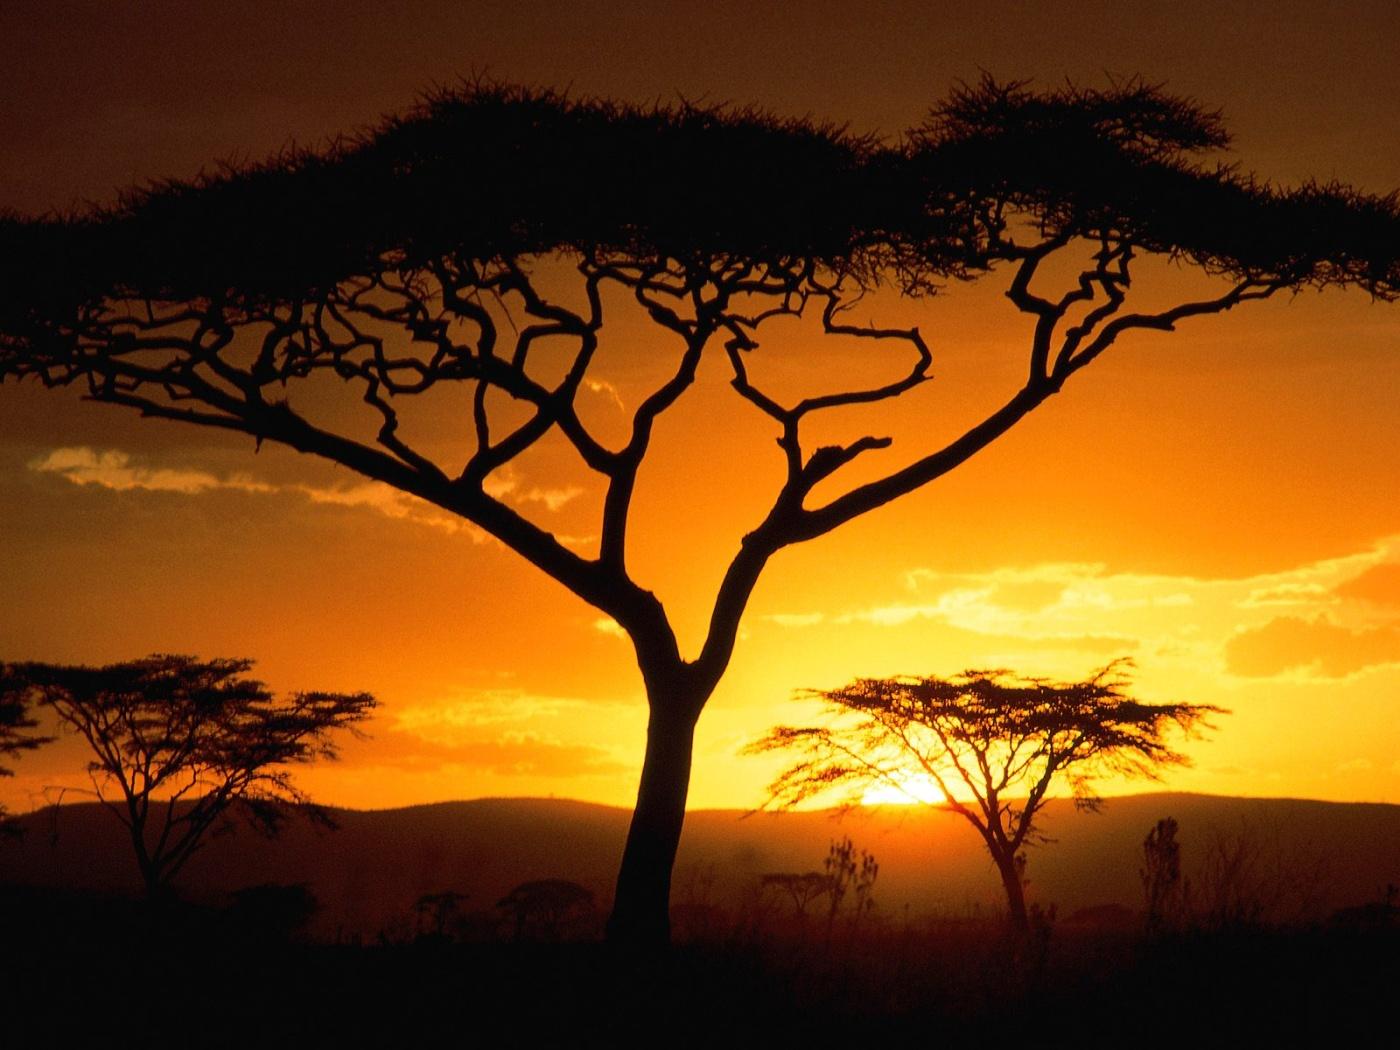 africa wallpaper,natural landscape,sky,nature,savanna,tree